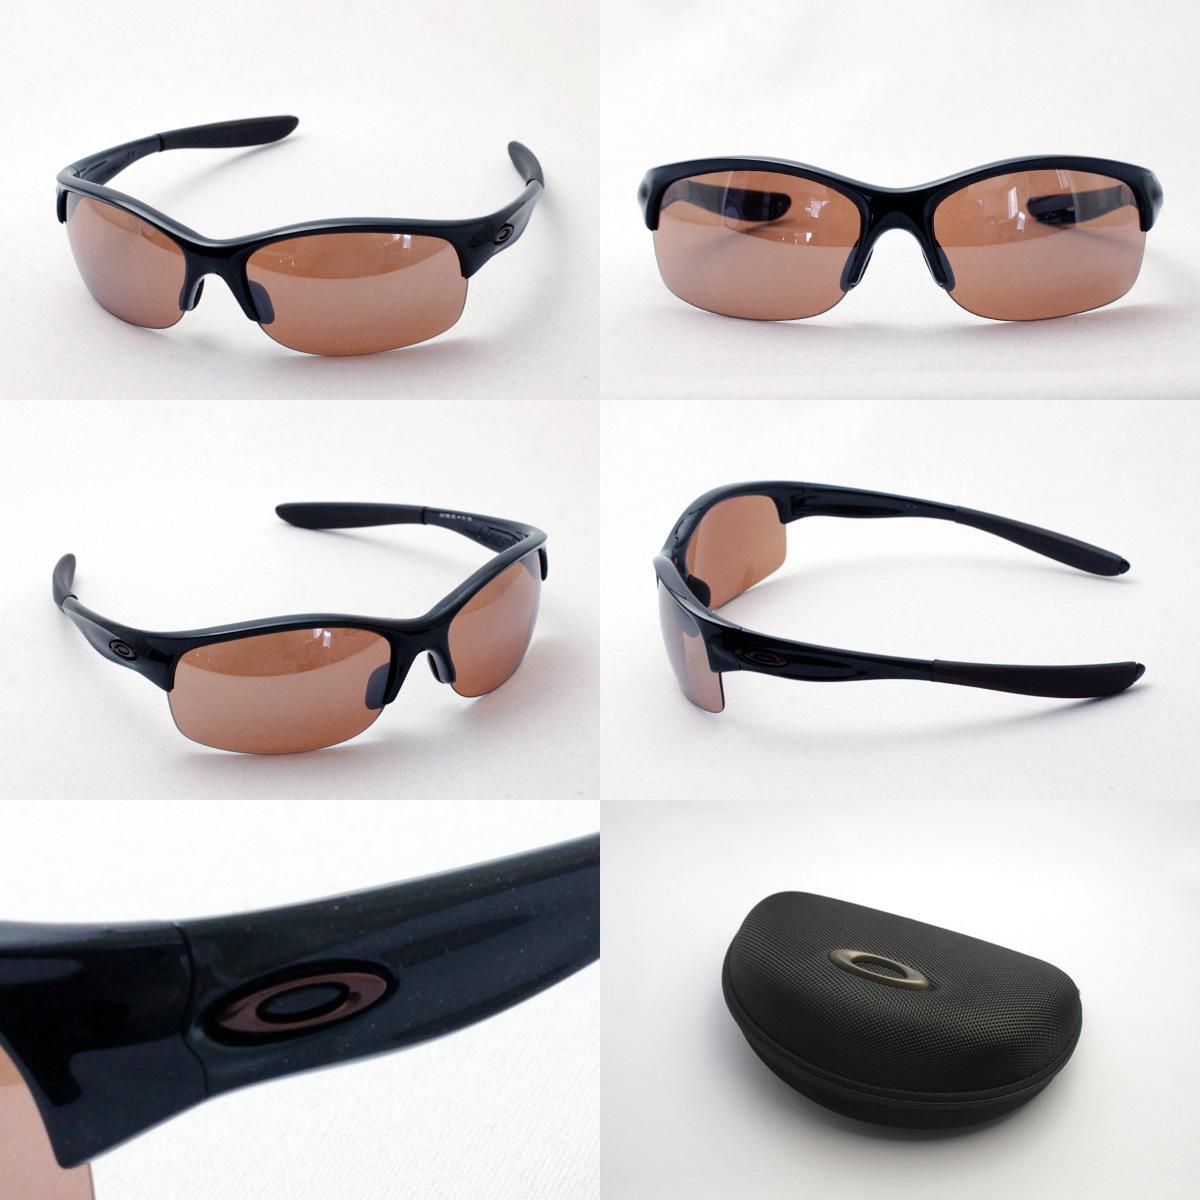 Glasses Frames In New Zealand : oakley glasses new zealand